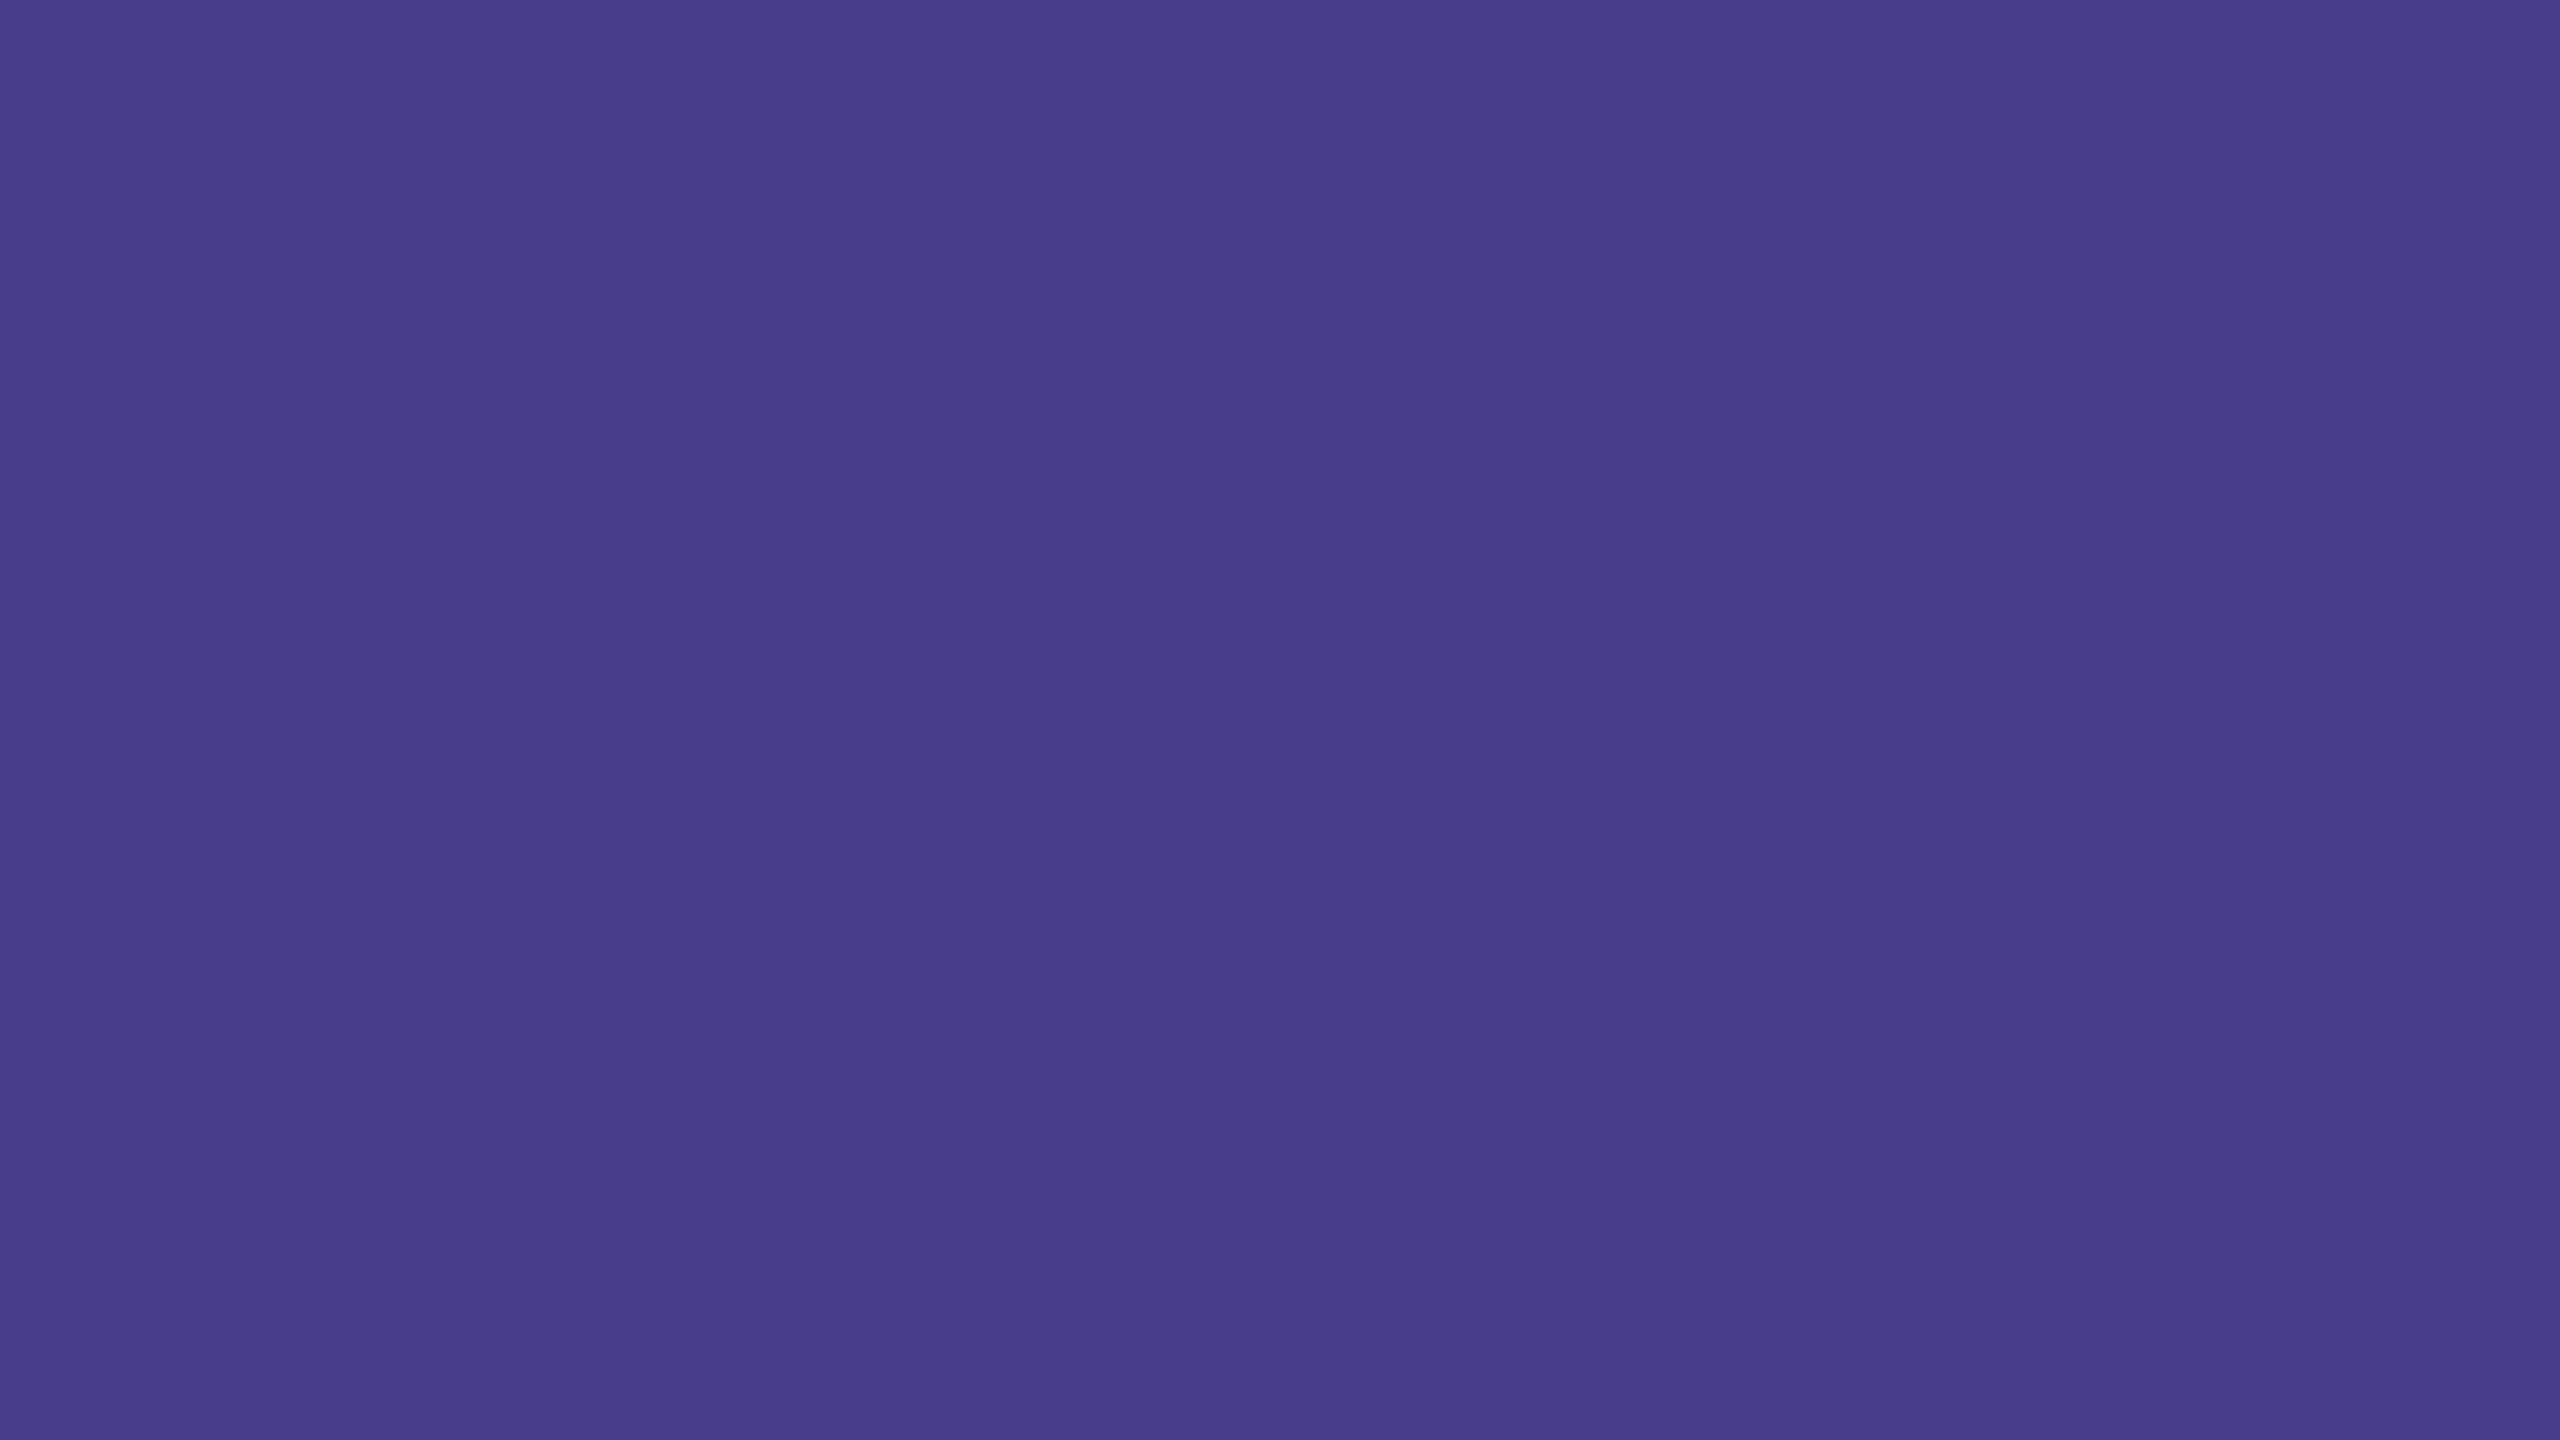 2560x1440 Dark Slate Blue Solid Color Background